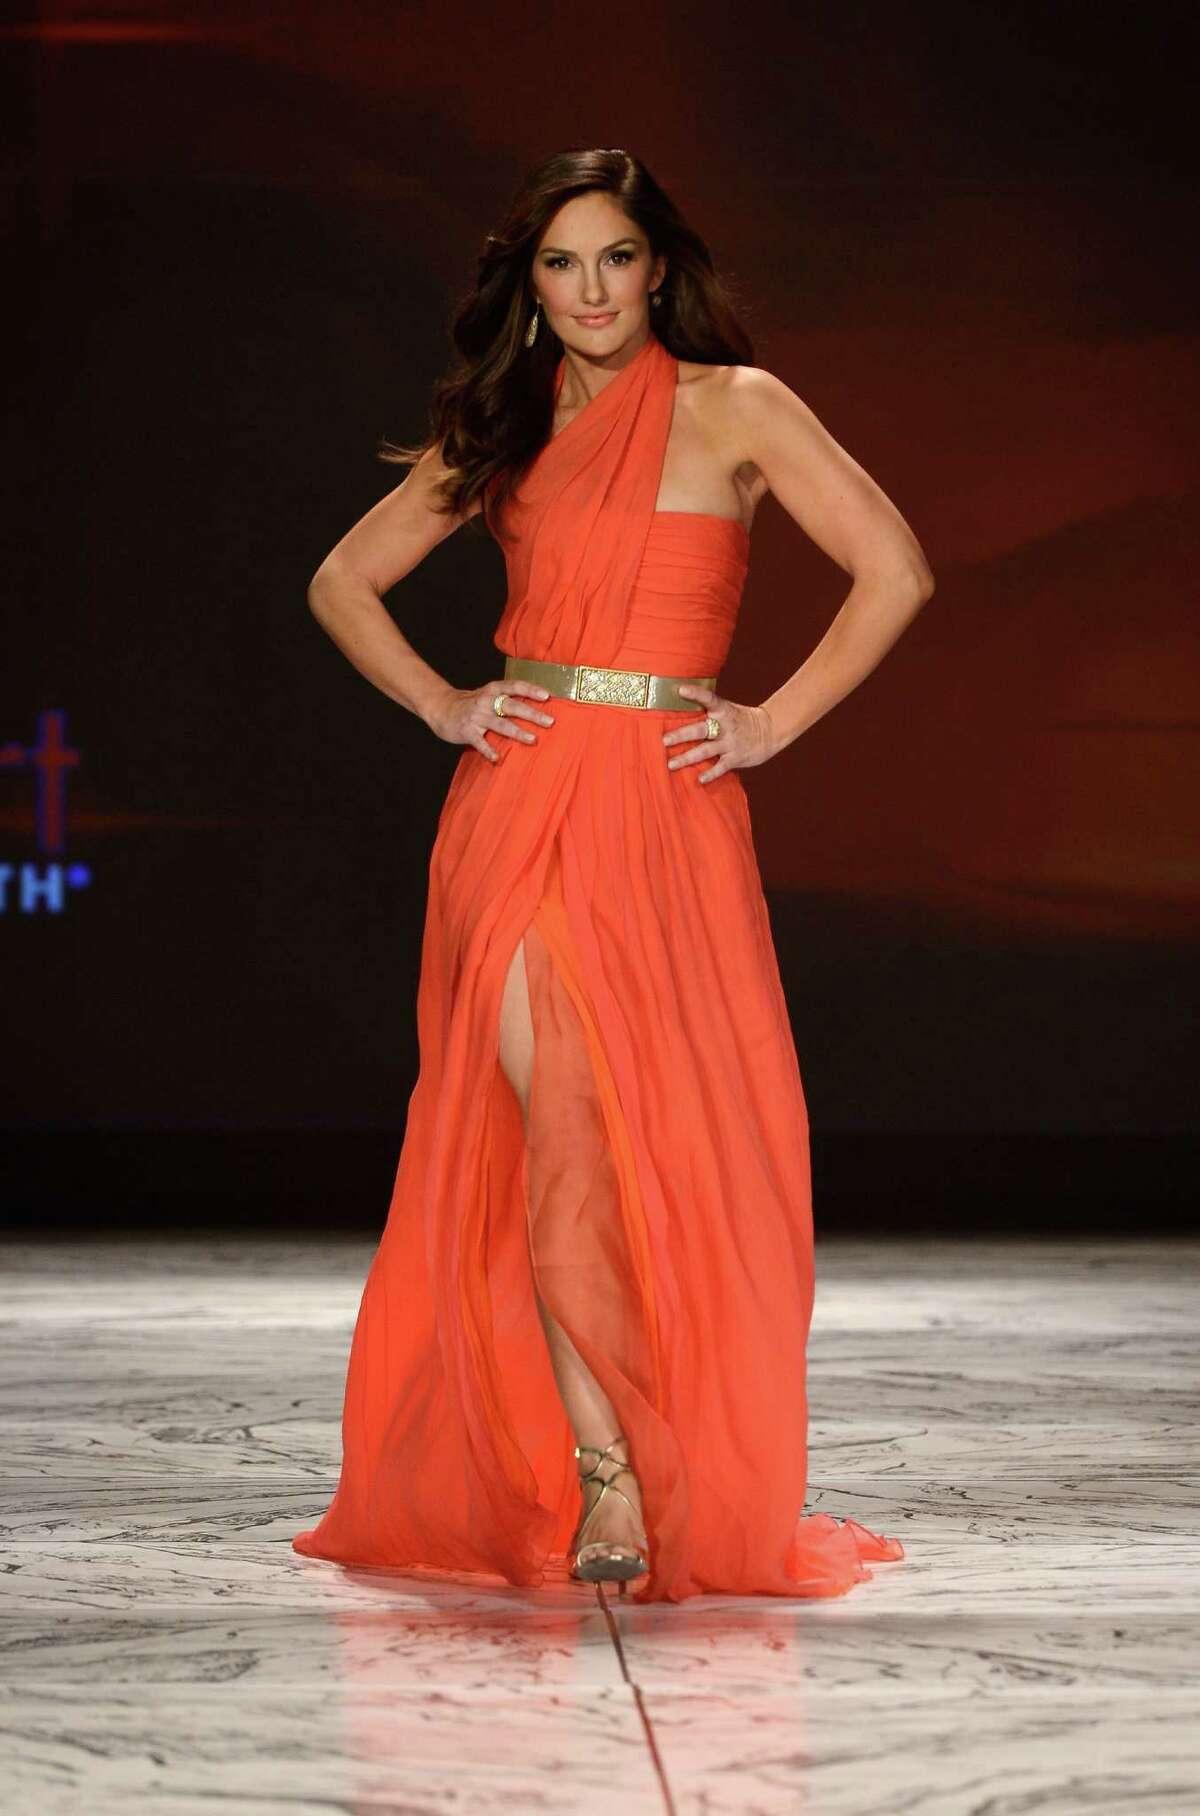 Actress Minka Kelly walks the runway at The Heart Truth 2013 Fashion Show at Hammerstein Ballroom.